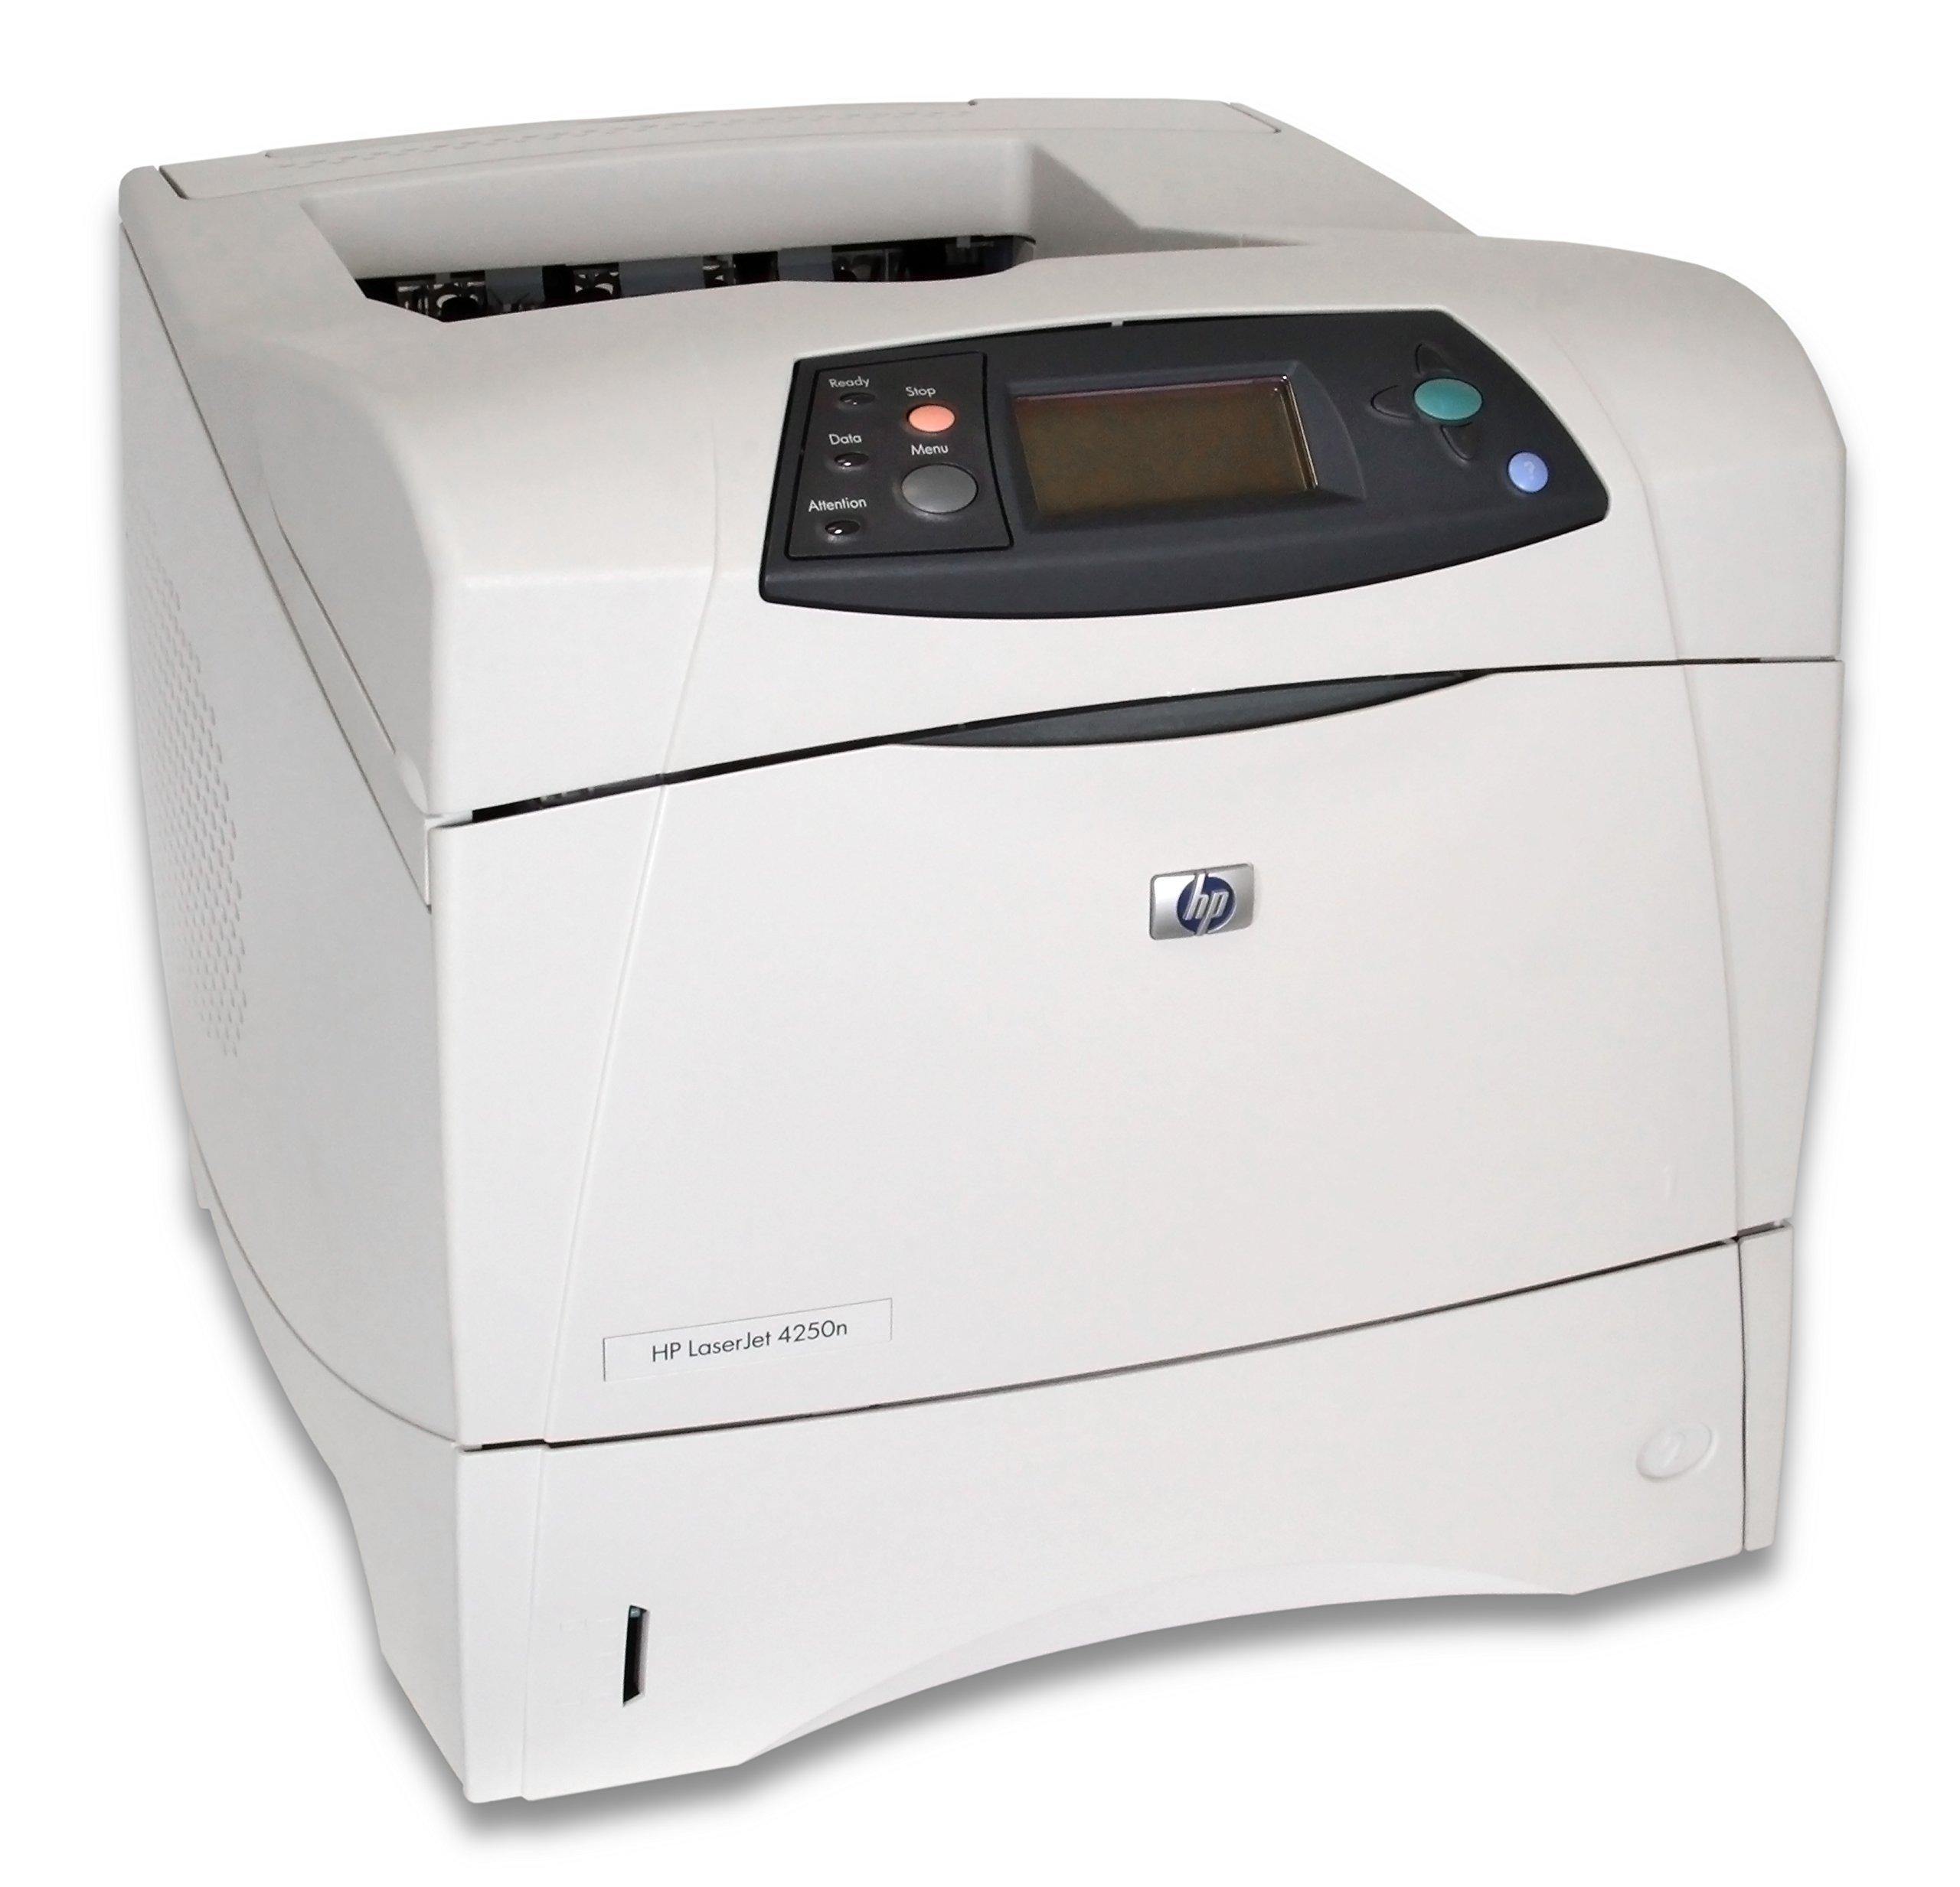 HP  LaserJet 4250N Laser Printer (Q5401A) - (Renewed) by HP (Image #1)